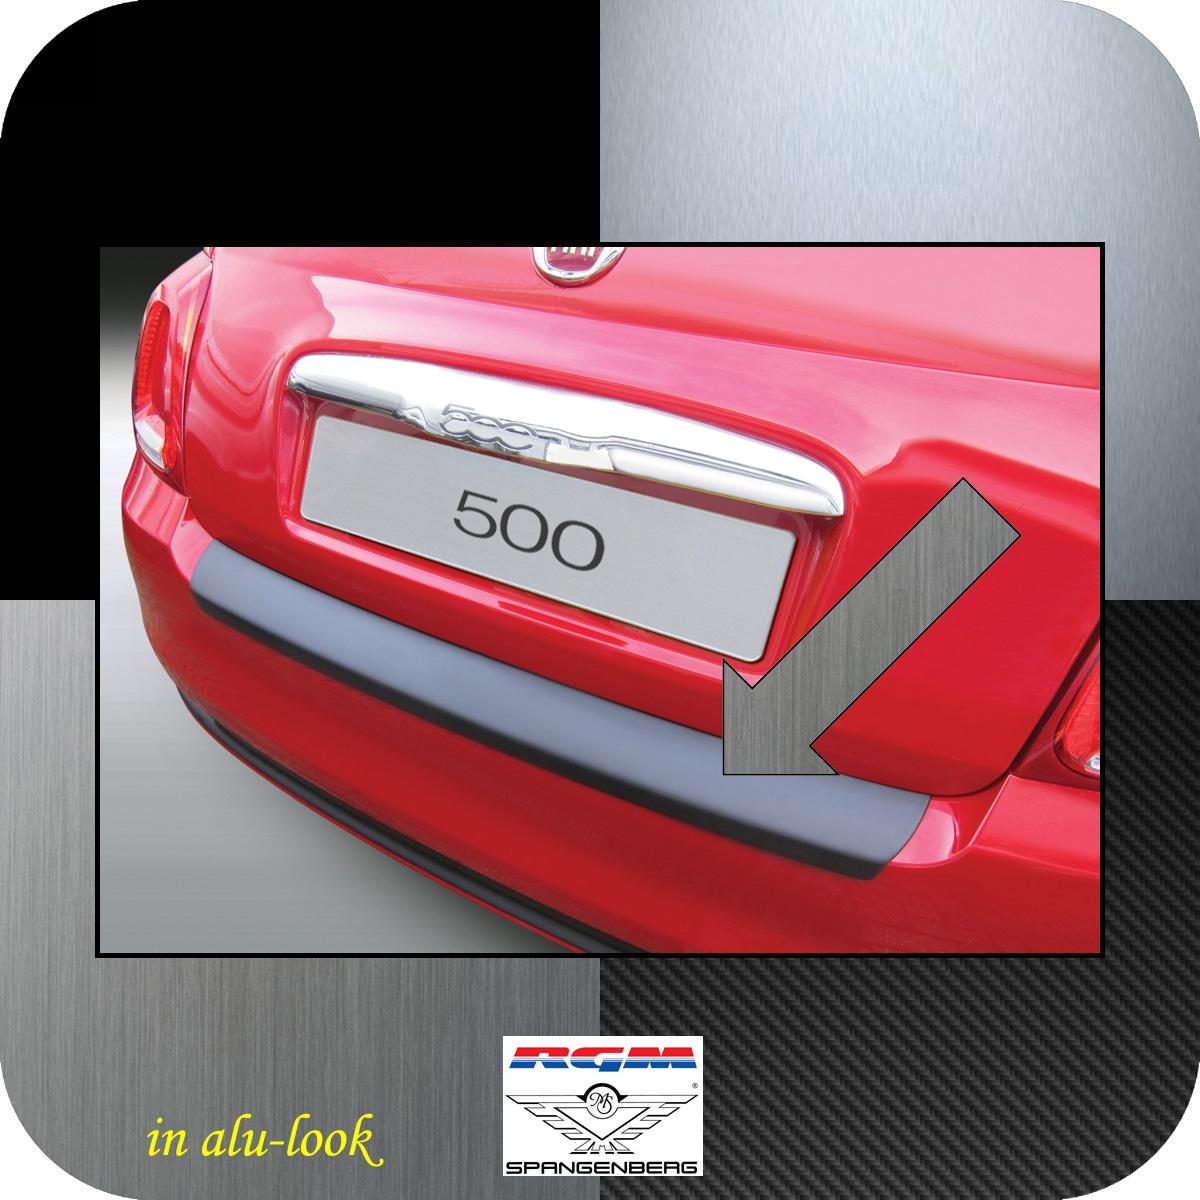 Ladekantenschutz Alu-Look Fiat 500 ab facelift Baujahr 2015- 3504914